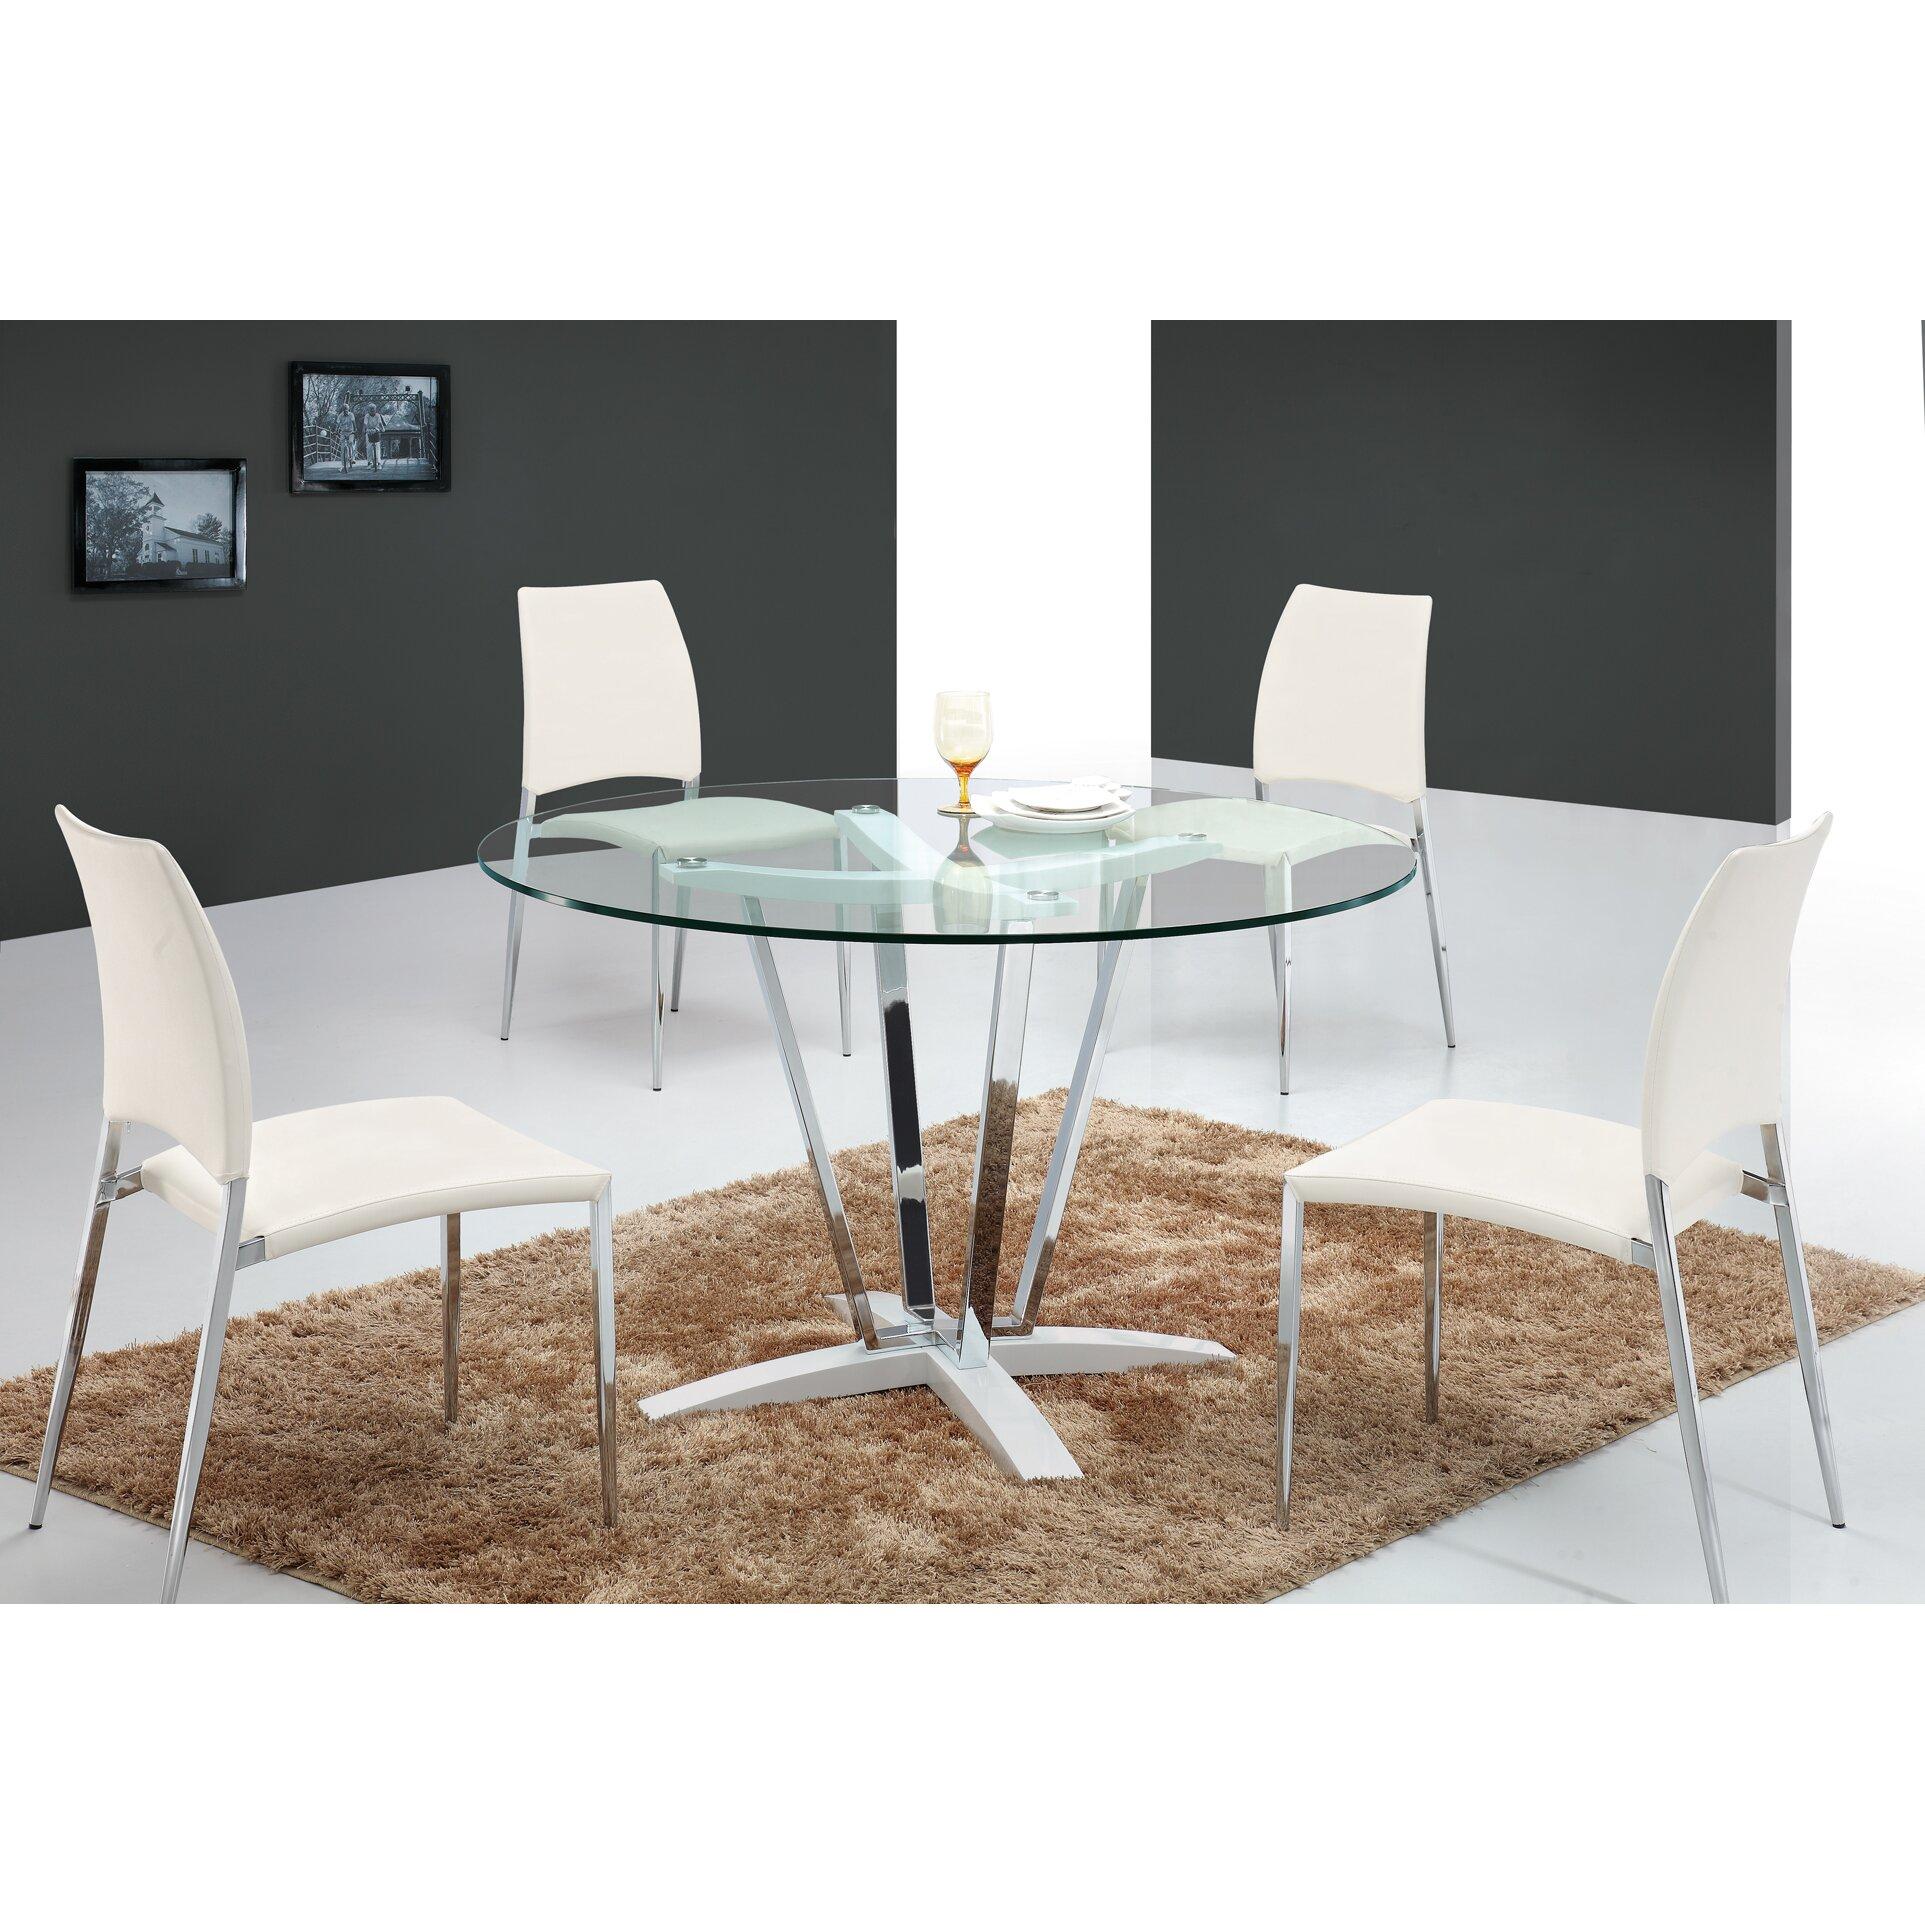 Casabianca furniture romance dining chair reviews wayfair